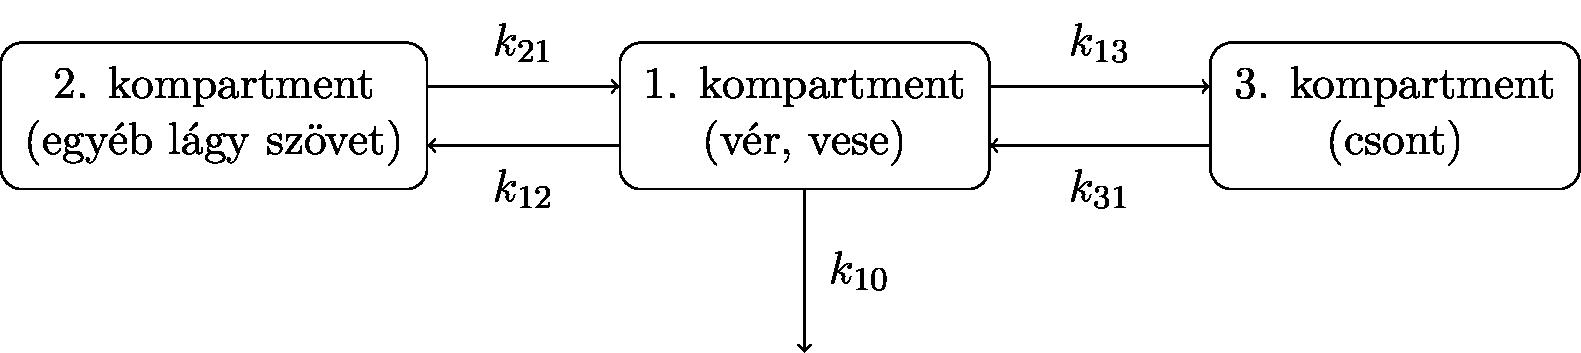 FerenciTamasVedooltasokrolATenyekAlapjan-figure0_v2.png